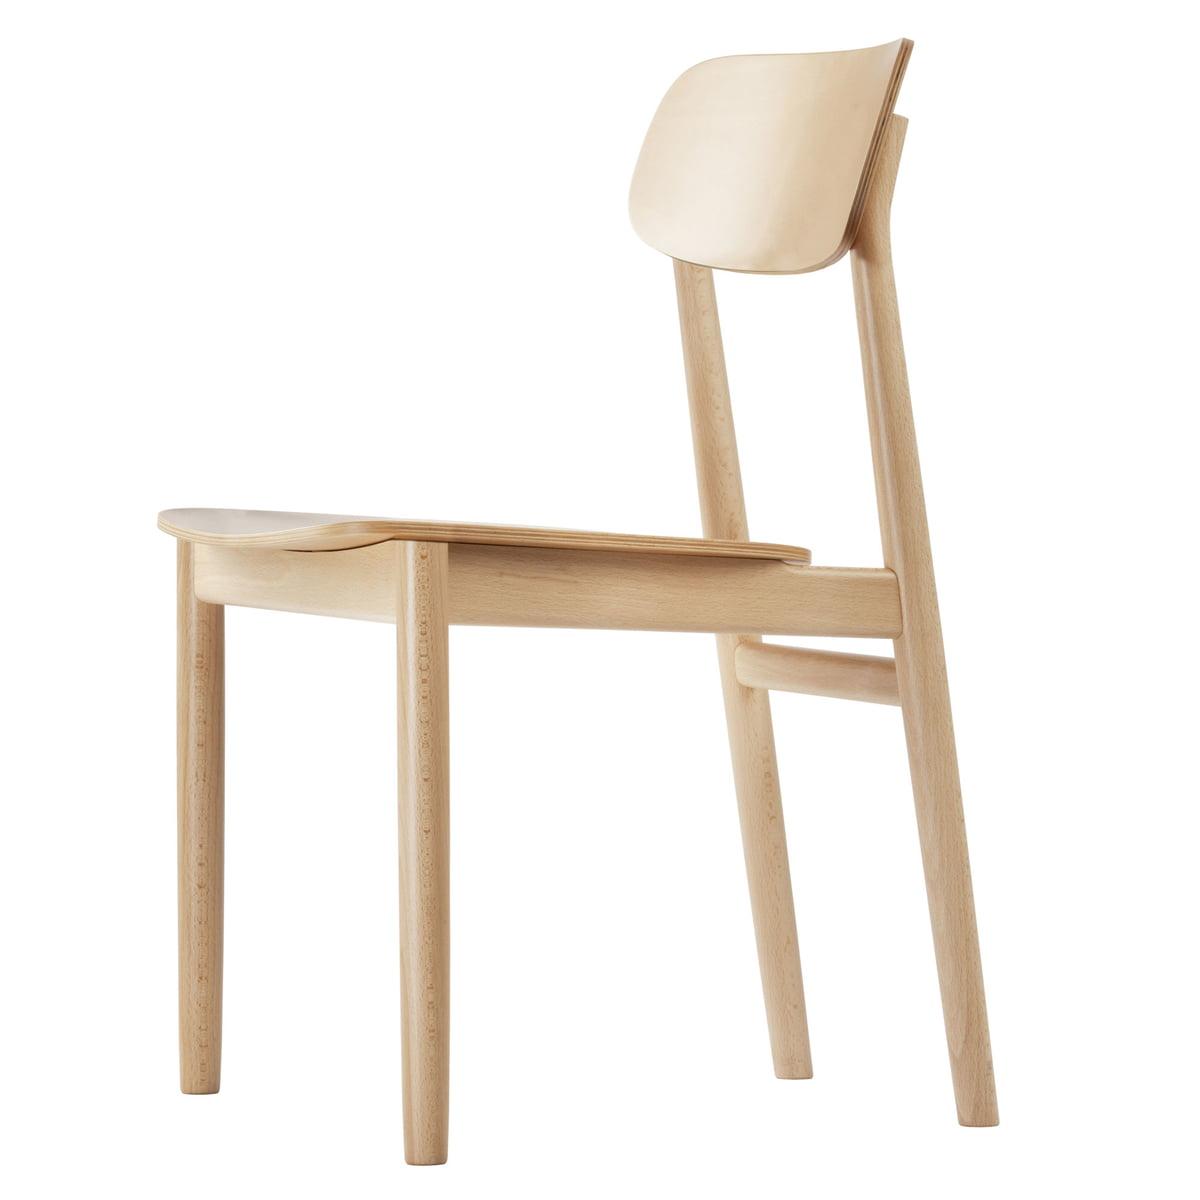 130 Chair by Thonet Connox Shop